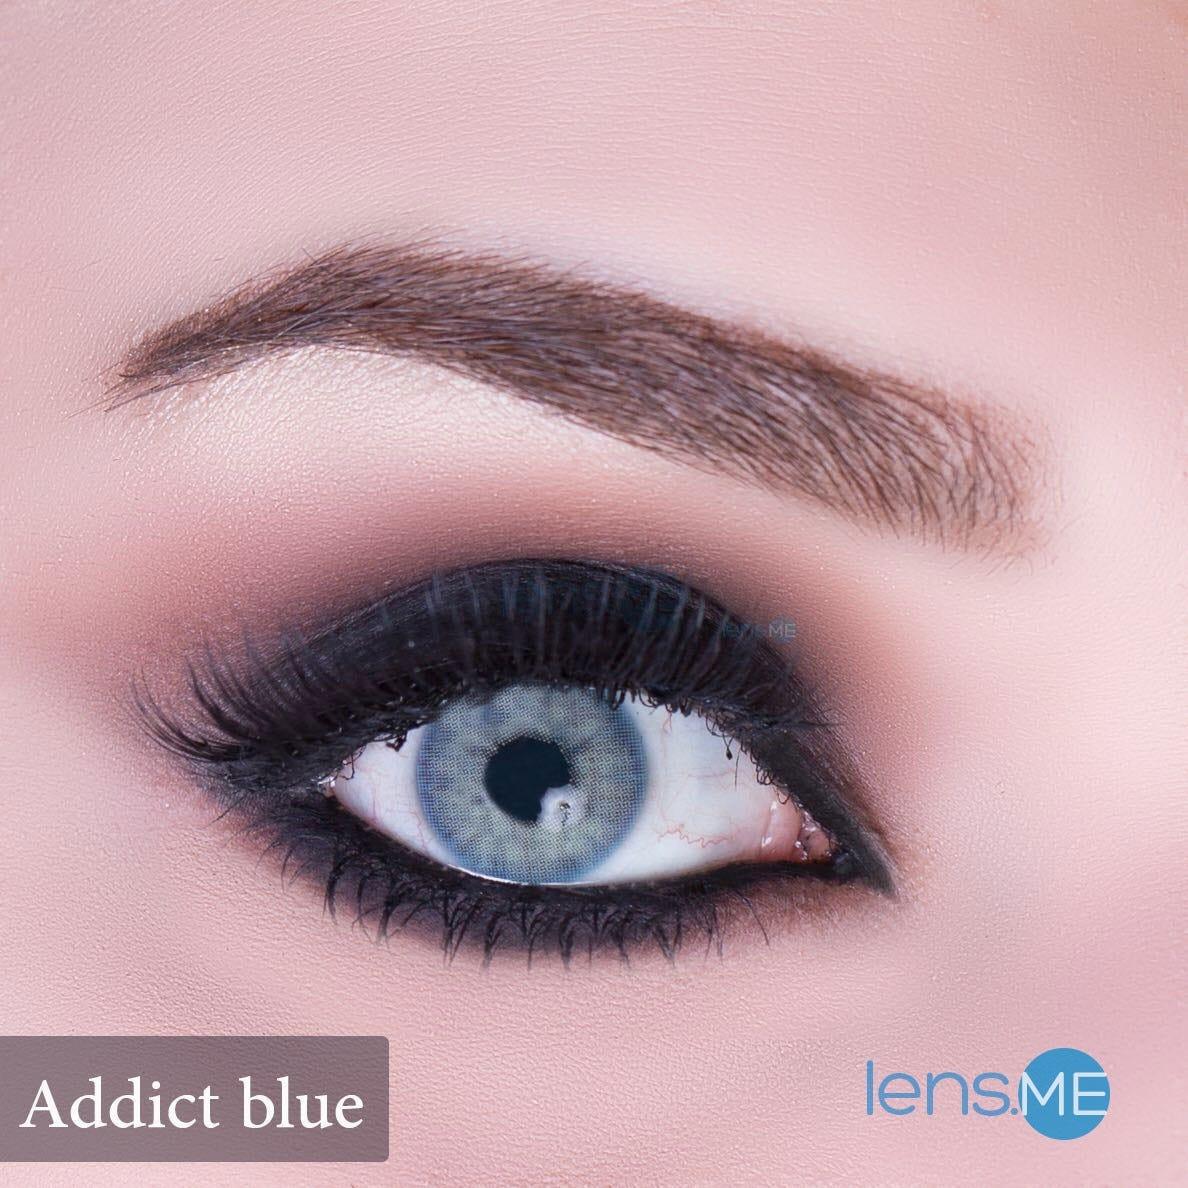 Anesthesia Addict Blue | 2 contact lenses | USA, UAE, UK ...